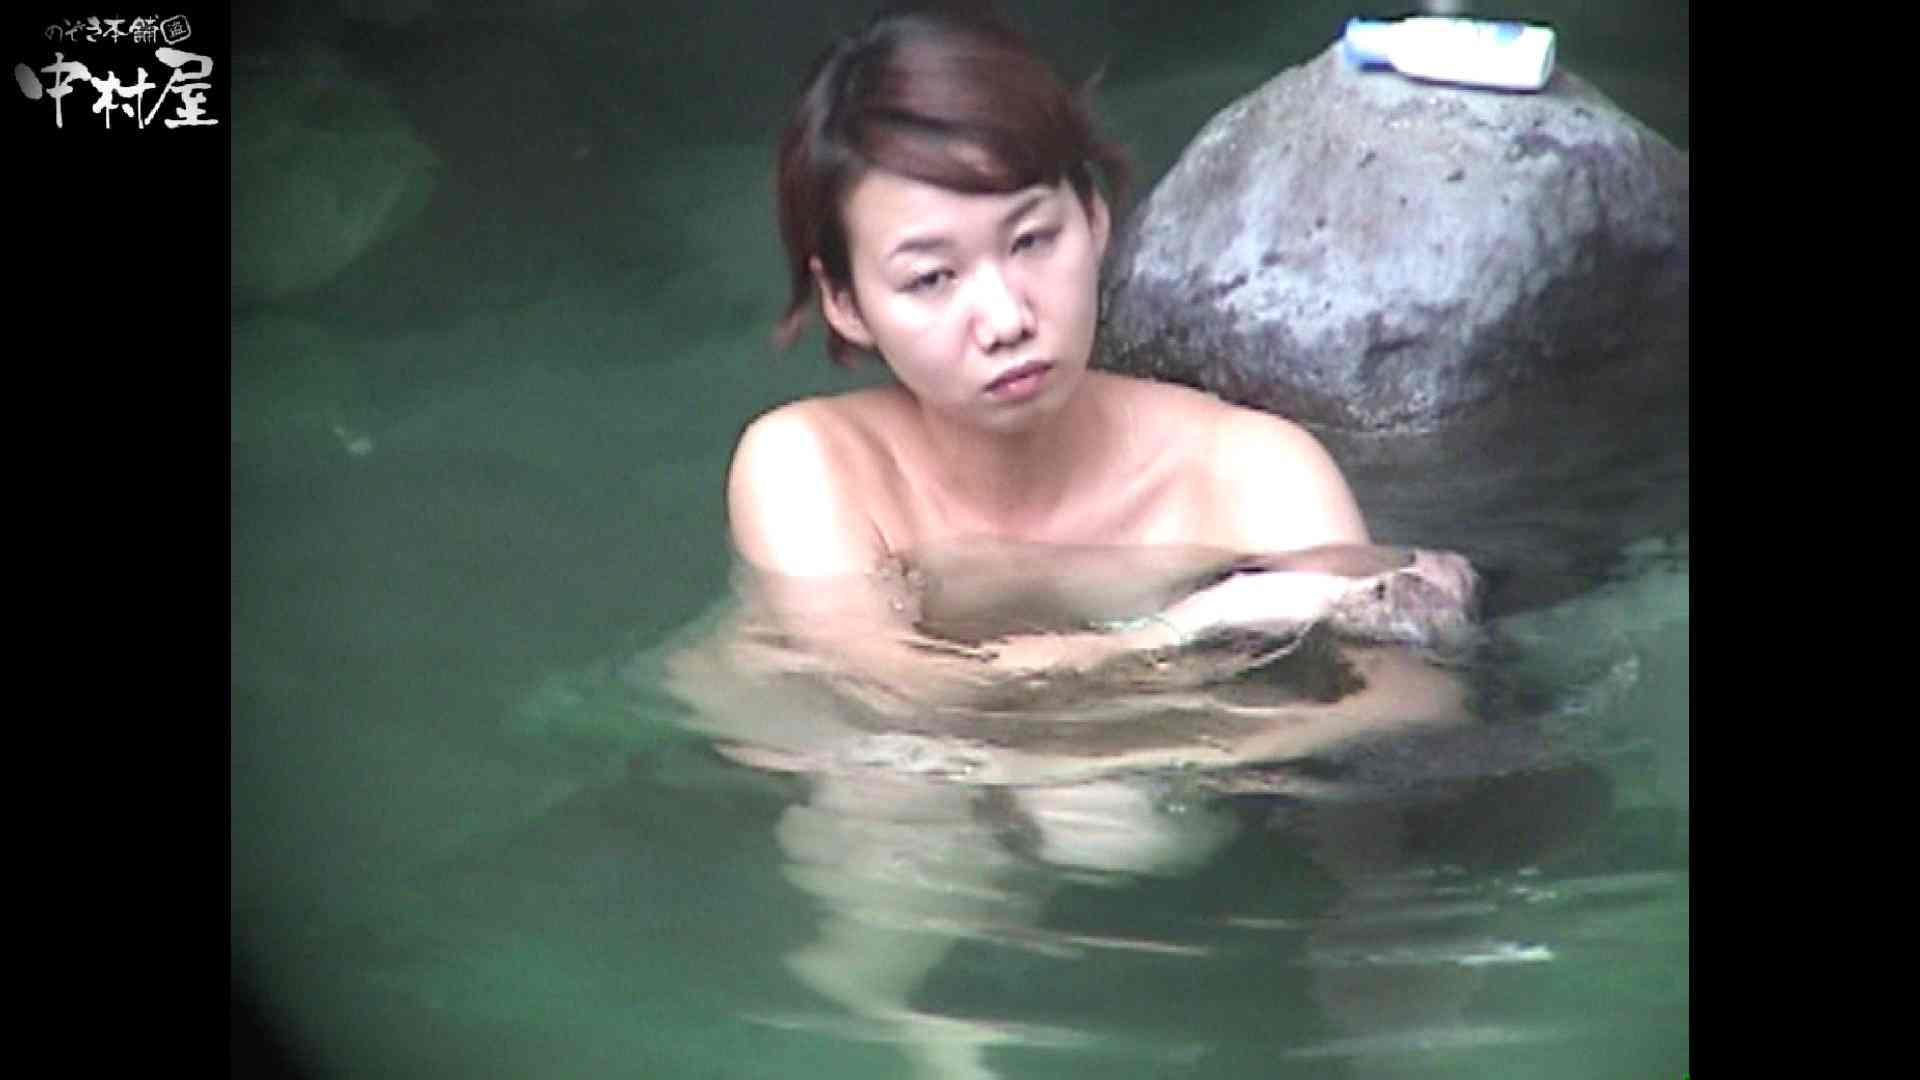 Aquaな露天風呂Vol.951 盗撮師作品  96pic 33